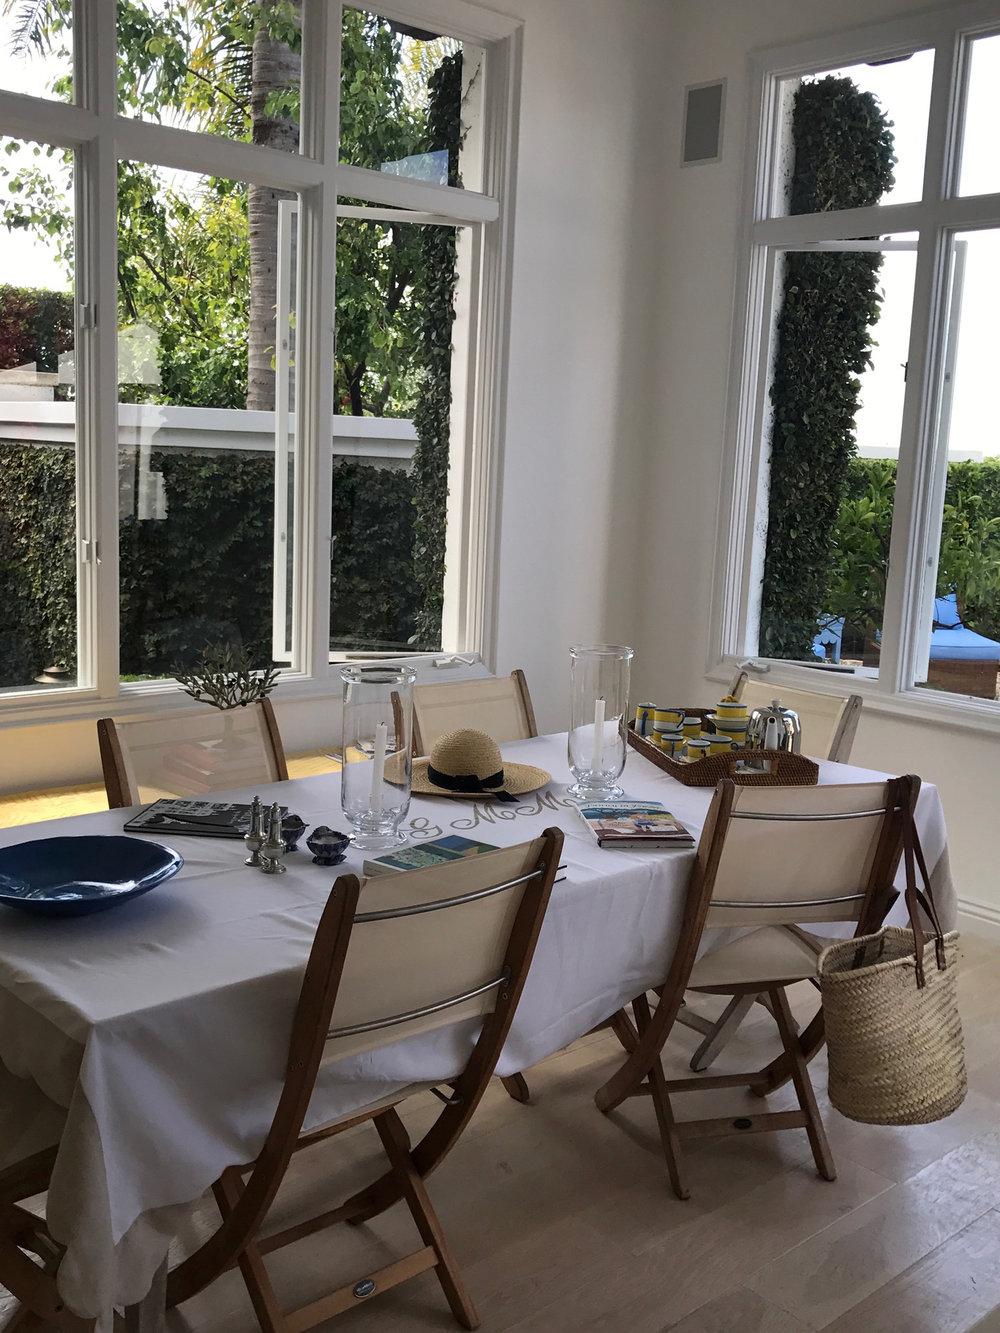 Laguna beach kitchen table with windows looking onto patio.